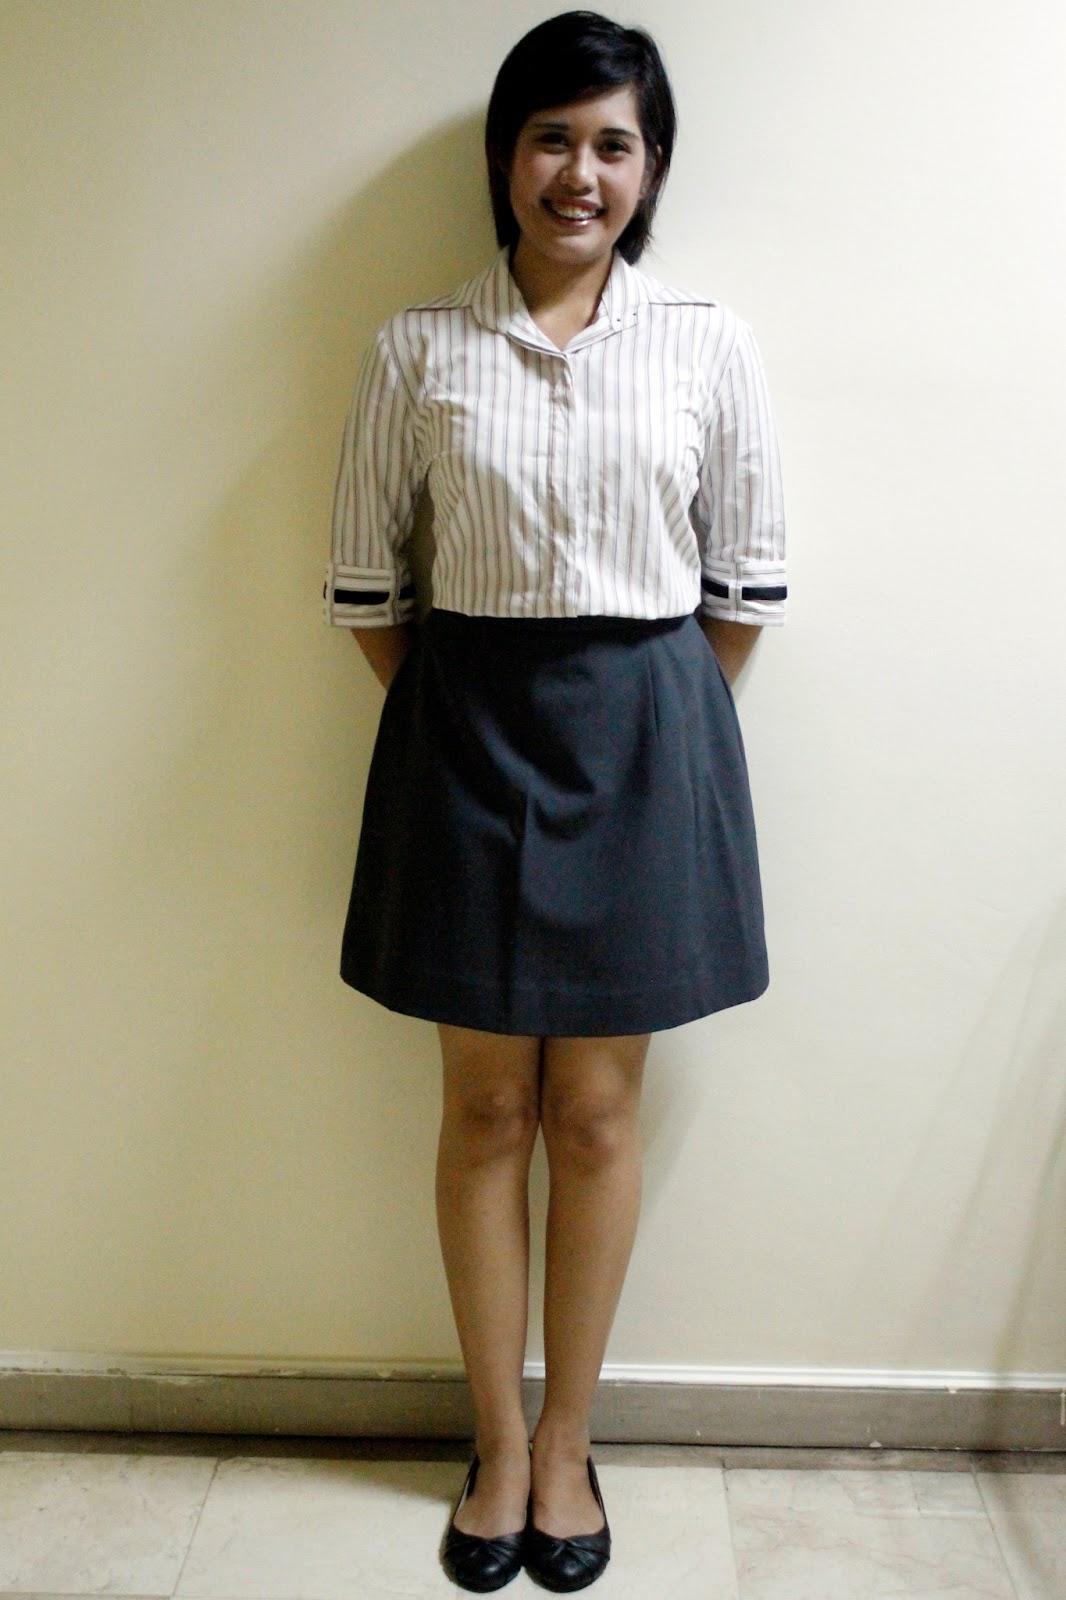 mizu at work corporate attire